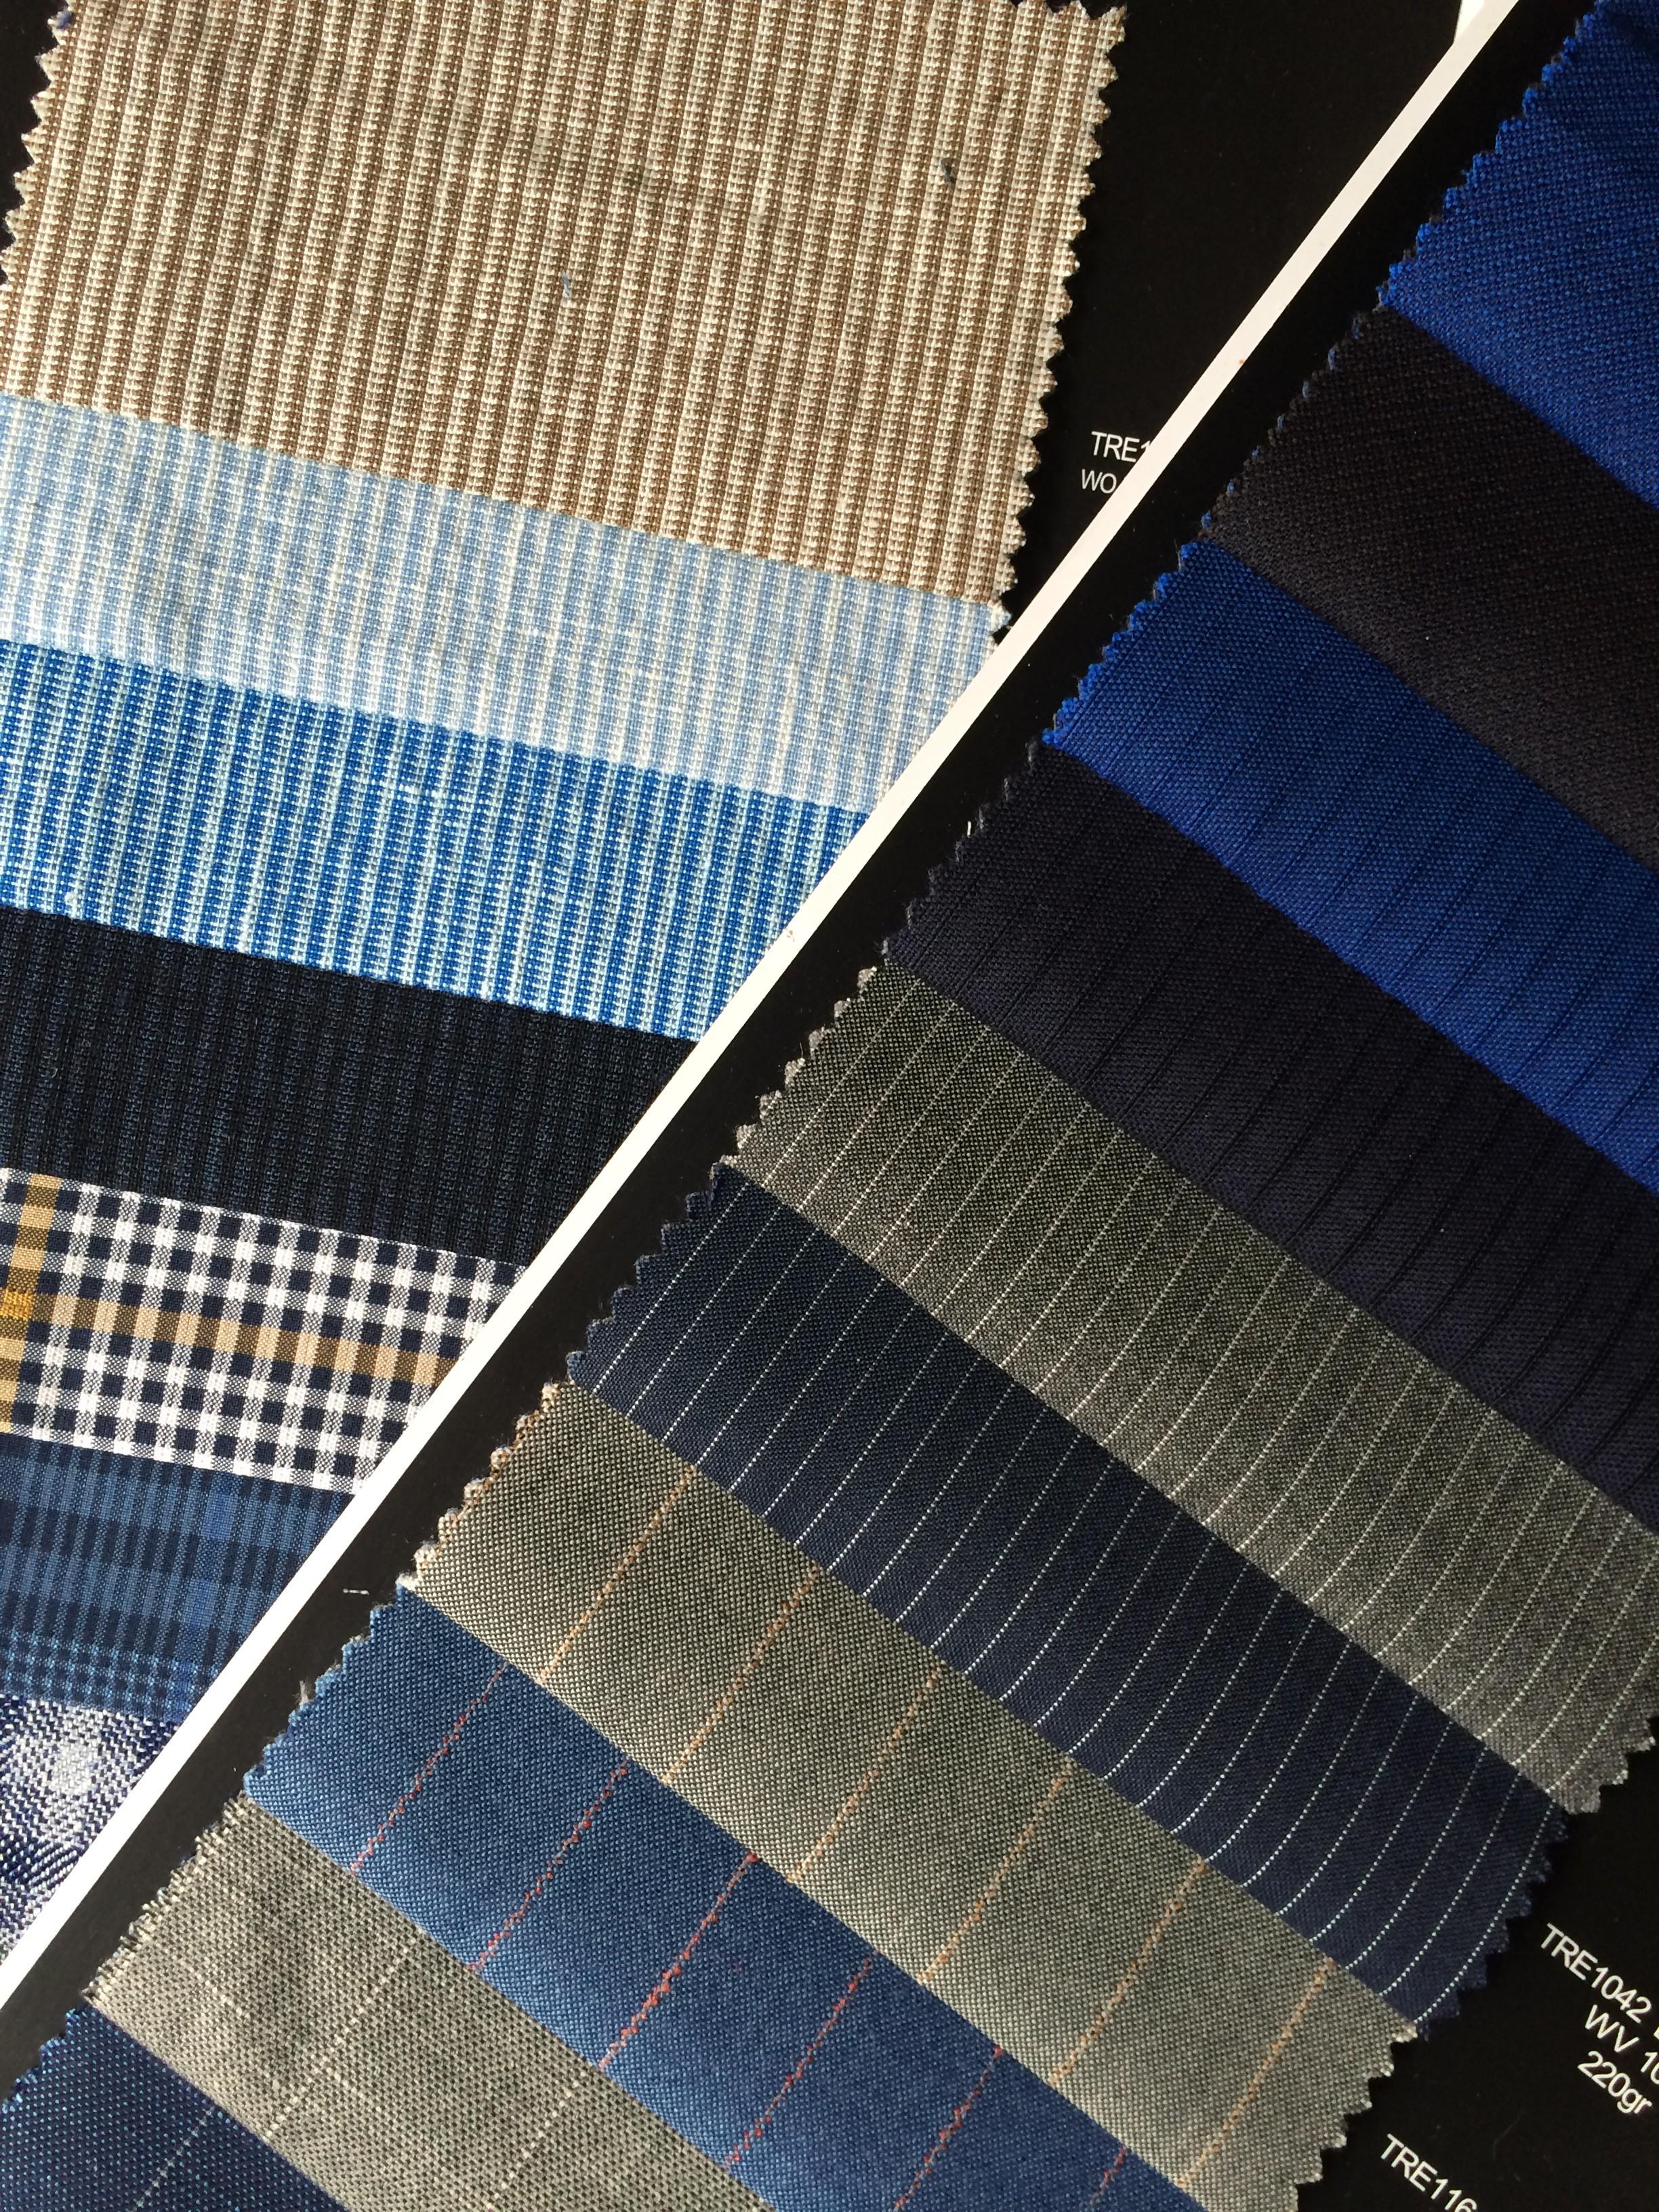 Spring Drago and VBC fabrics - JMac's Clothiers